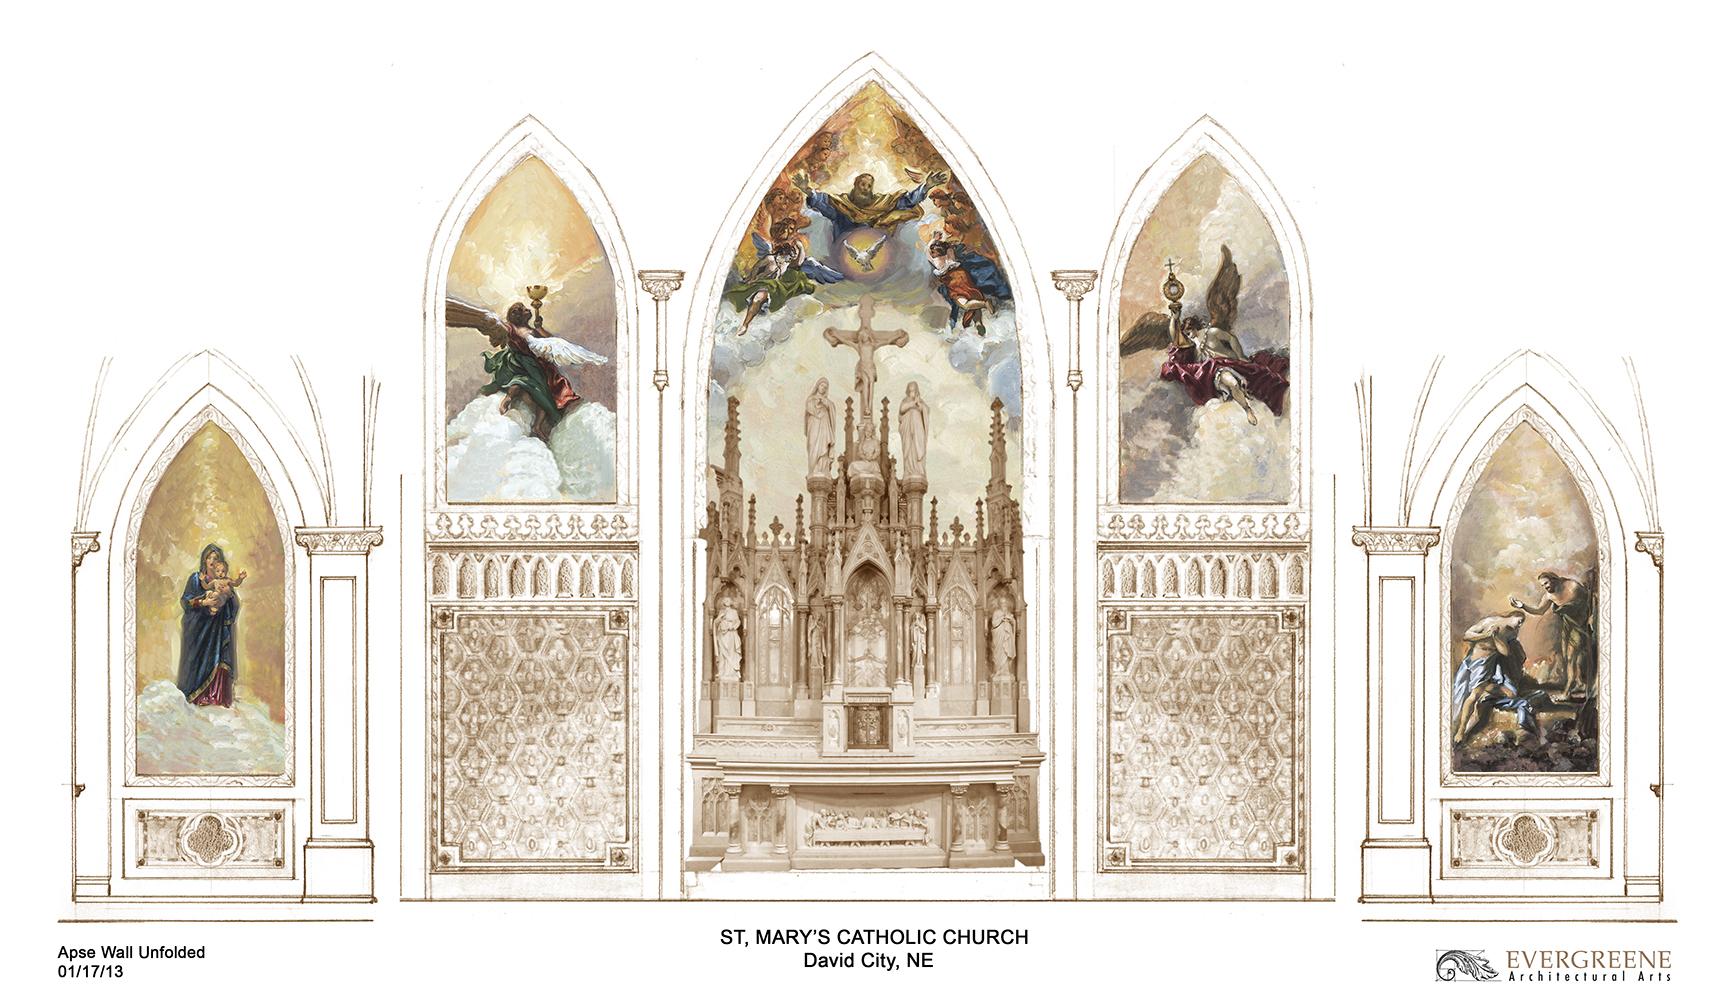 Proposed interior murals by EverGreene Architectural Arts